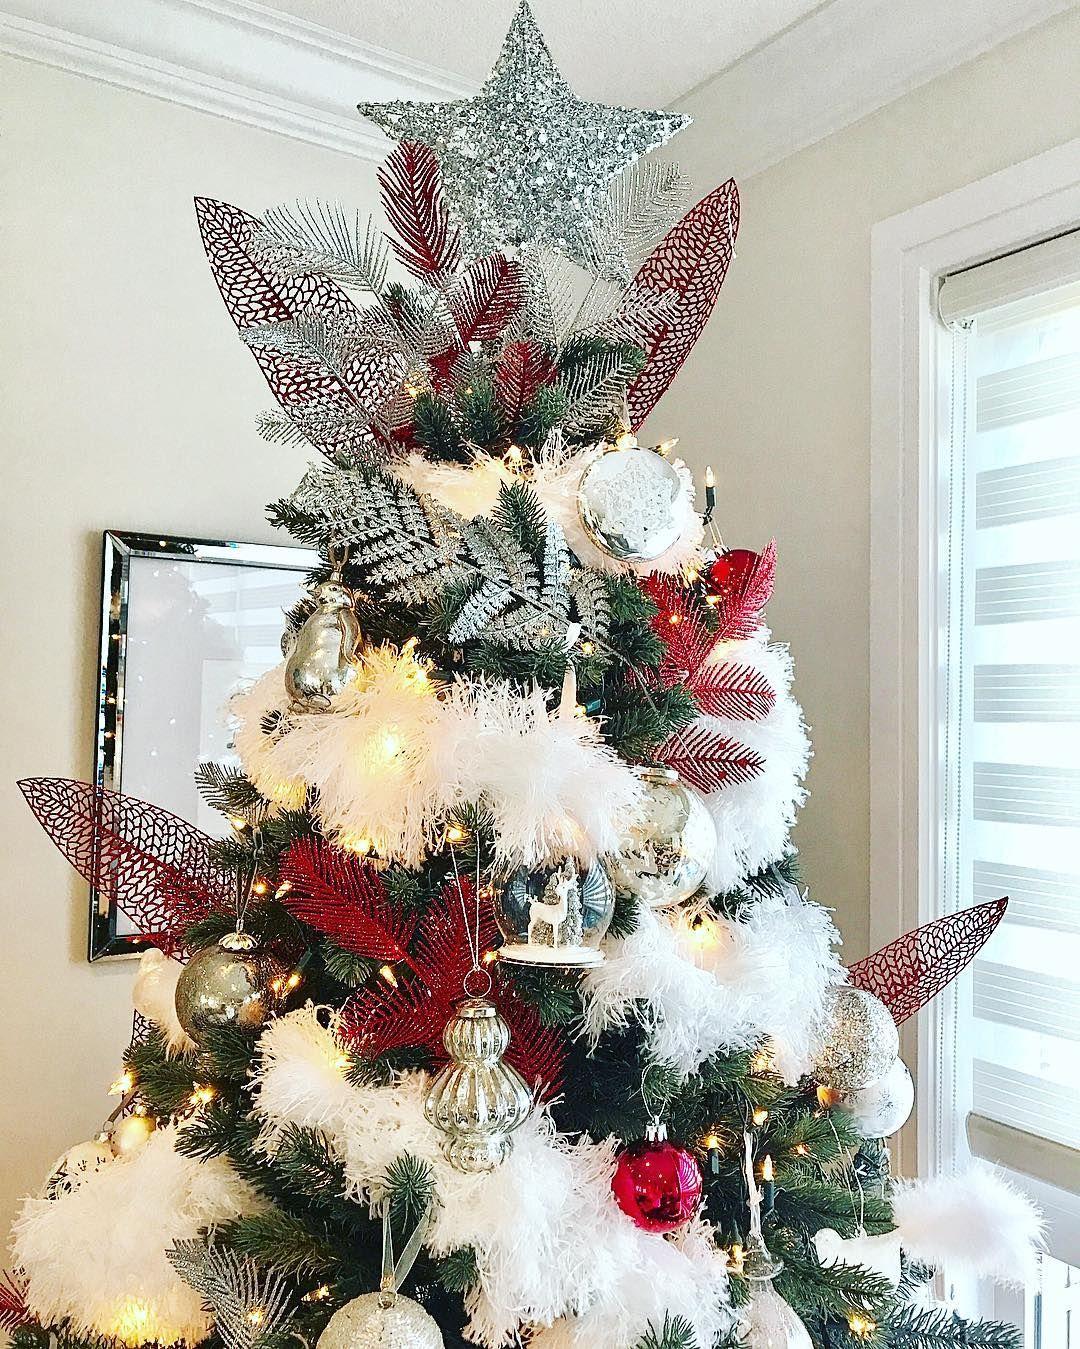 Christmas tree image by Ann Dutko on Tree | Holiday decor ...